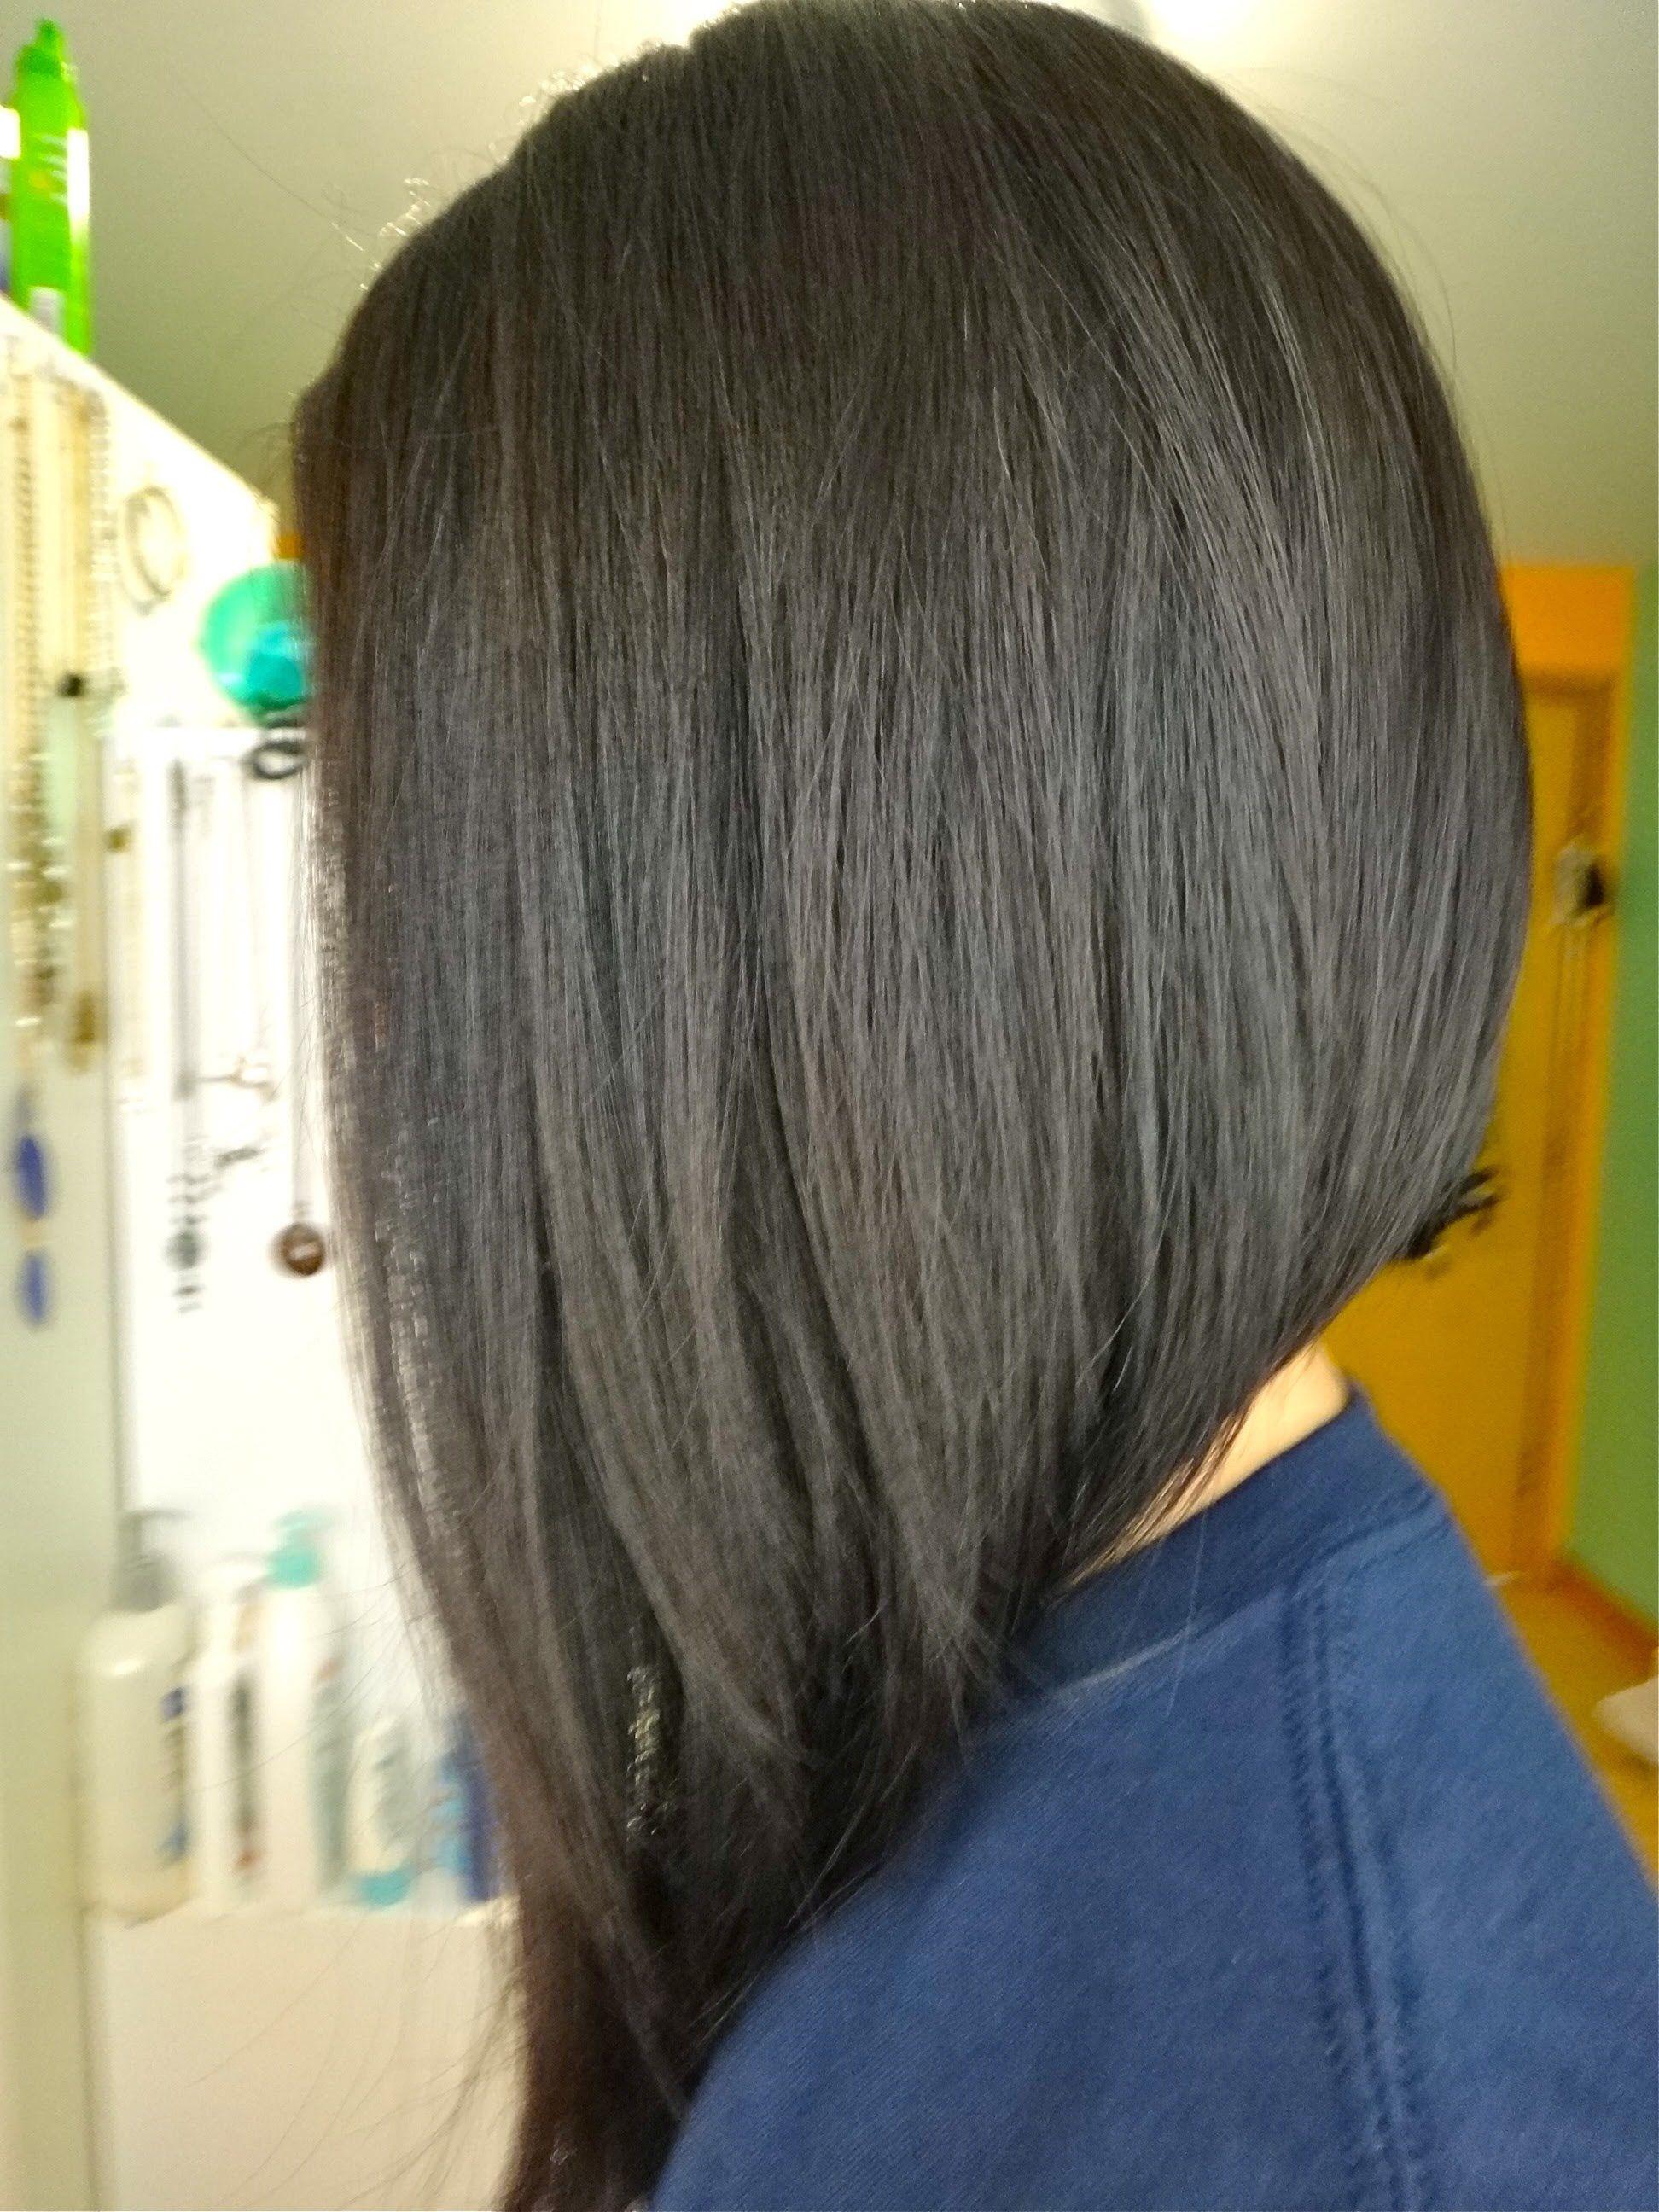 Image from http://bapyessirfansite.com/wp-content/uploads/2014/05/long-asymmetrical-haircut.jpg.